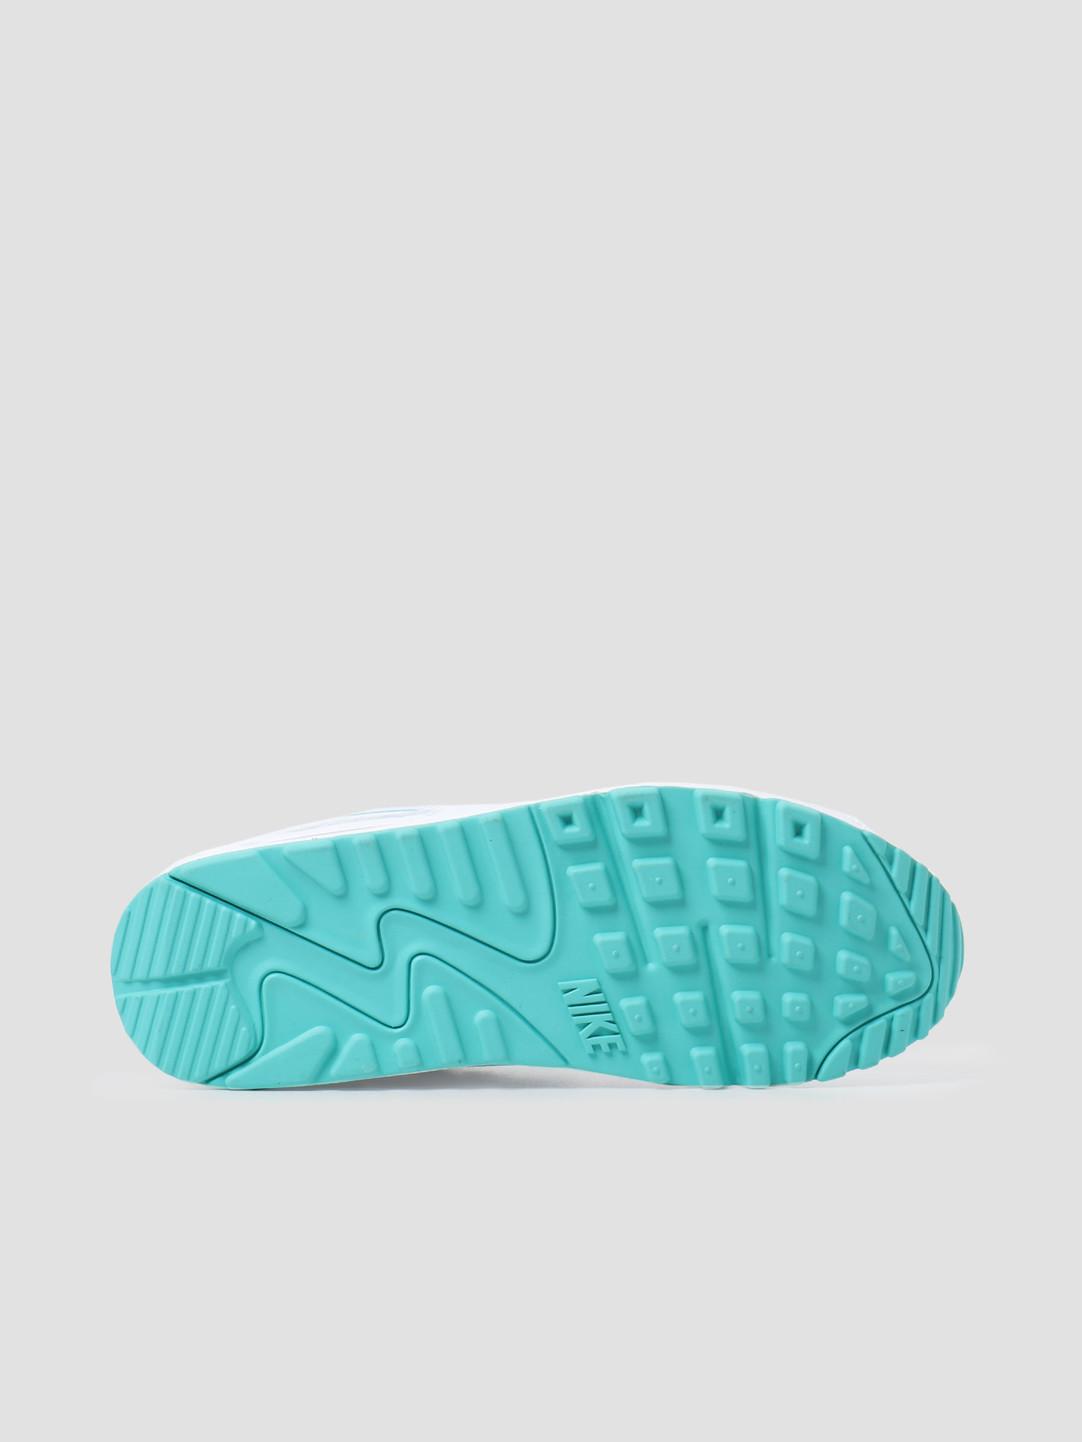 Nike Nike Air Max 90 White Hyper Jade Black CT1028-102